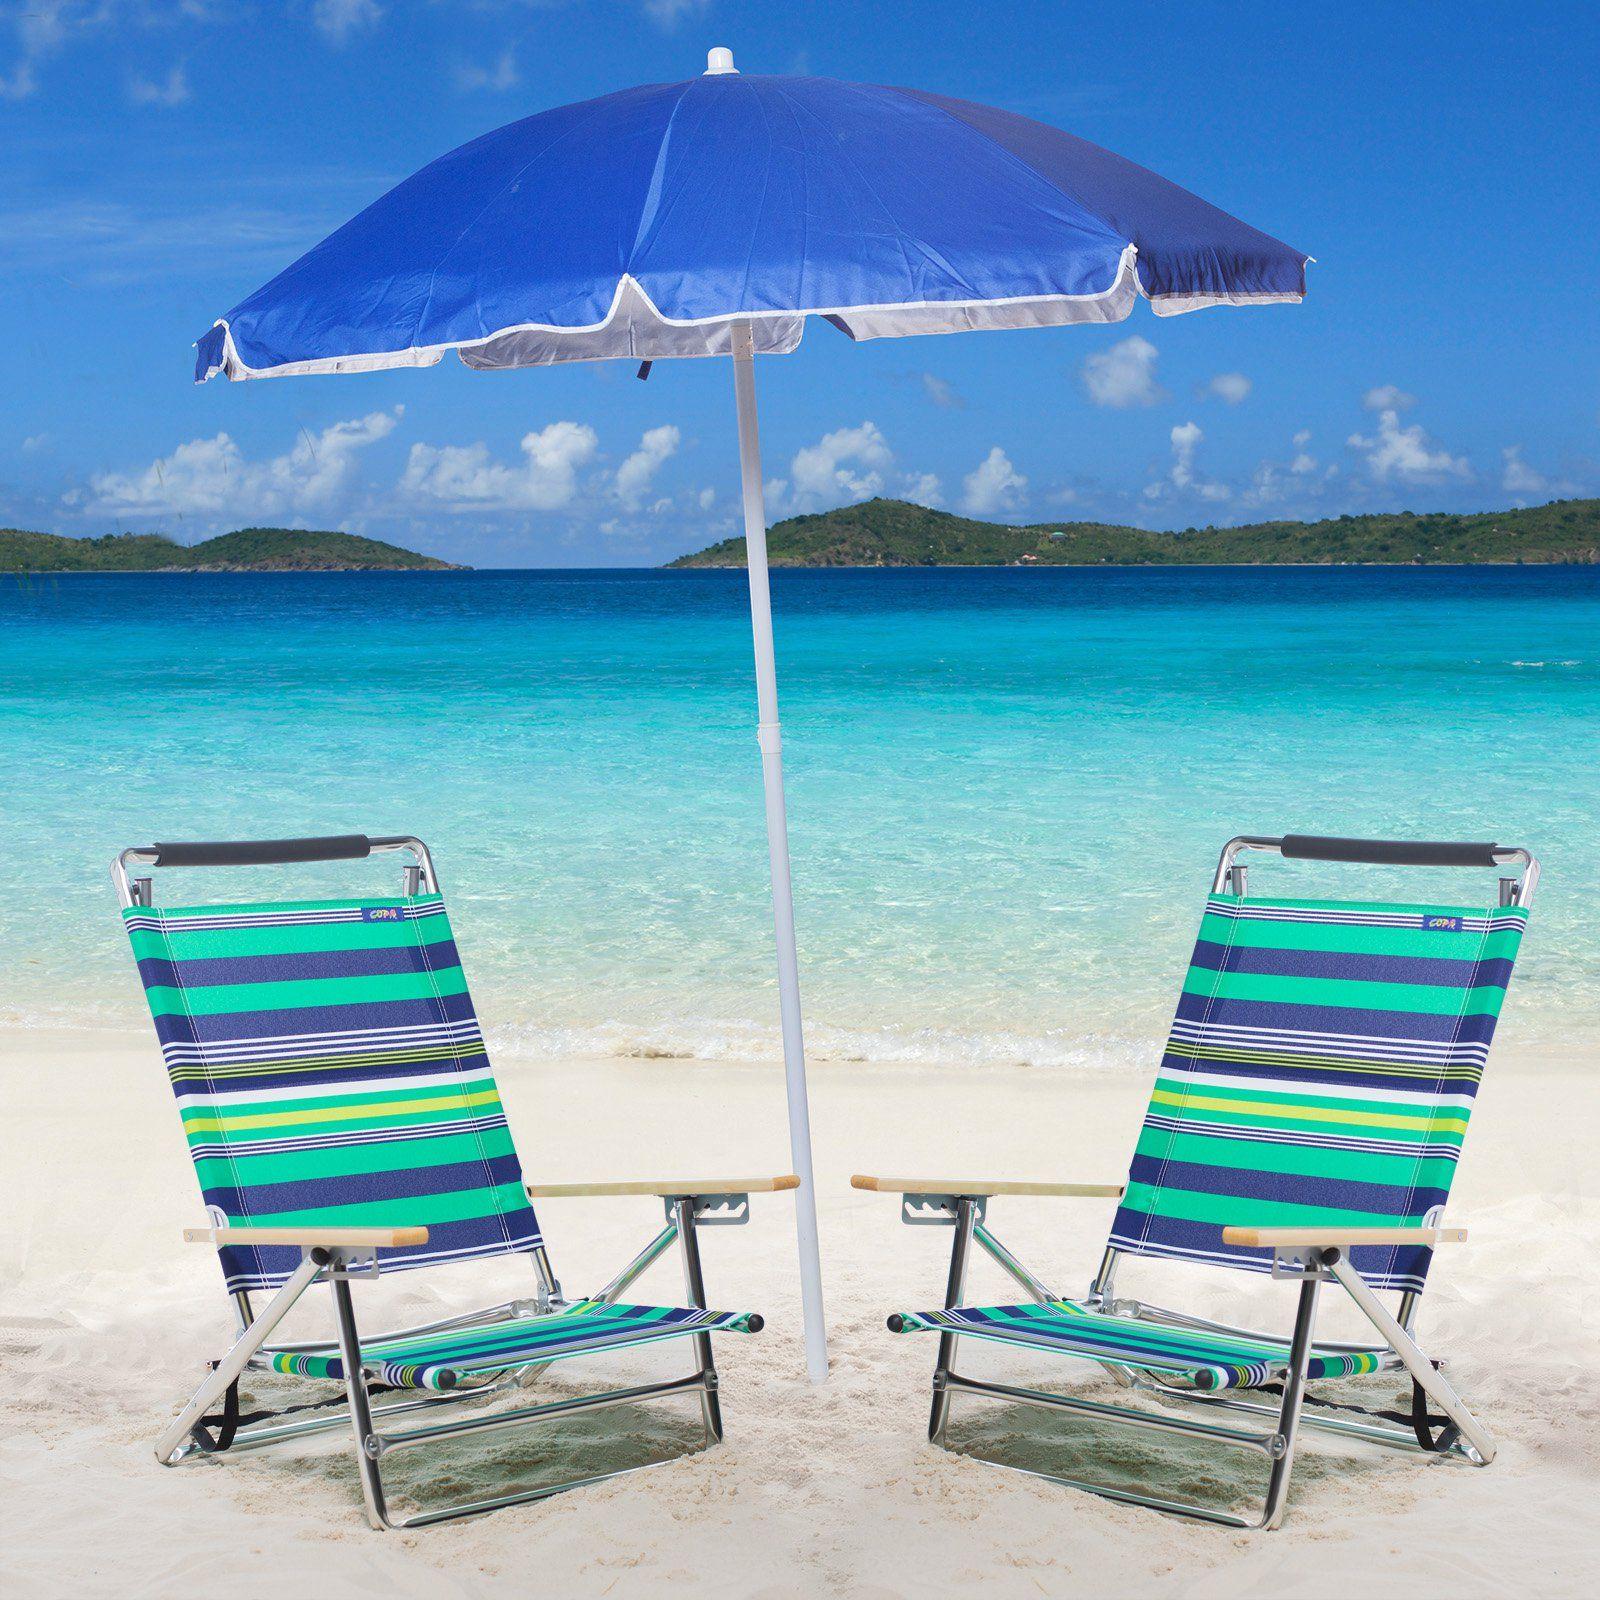 Outdoor Copa 5Position LayFlat Alum Beach Chair Set with